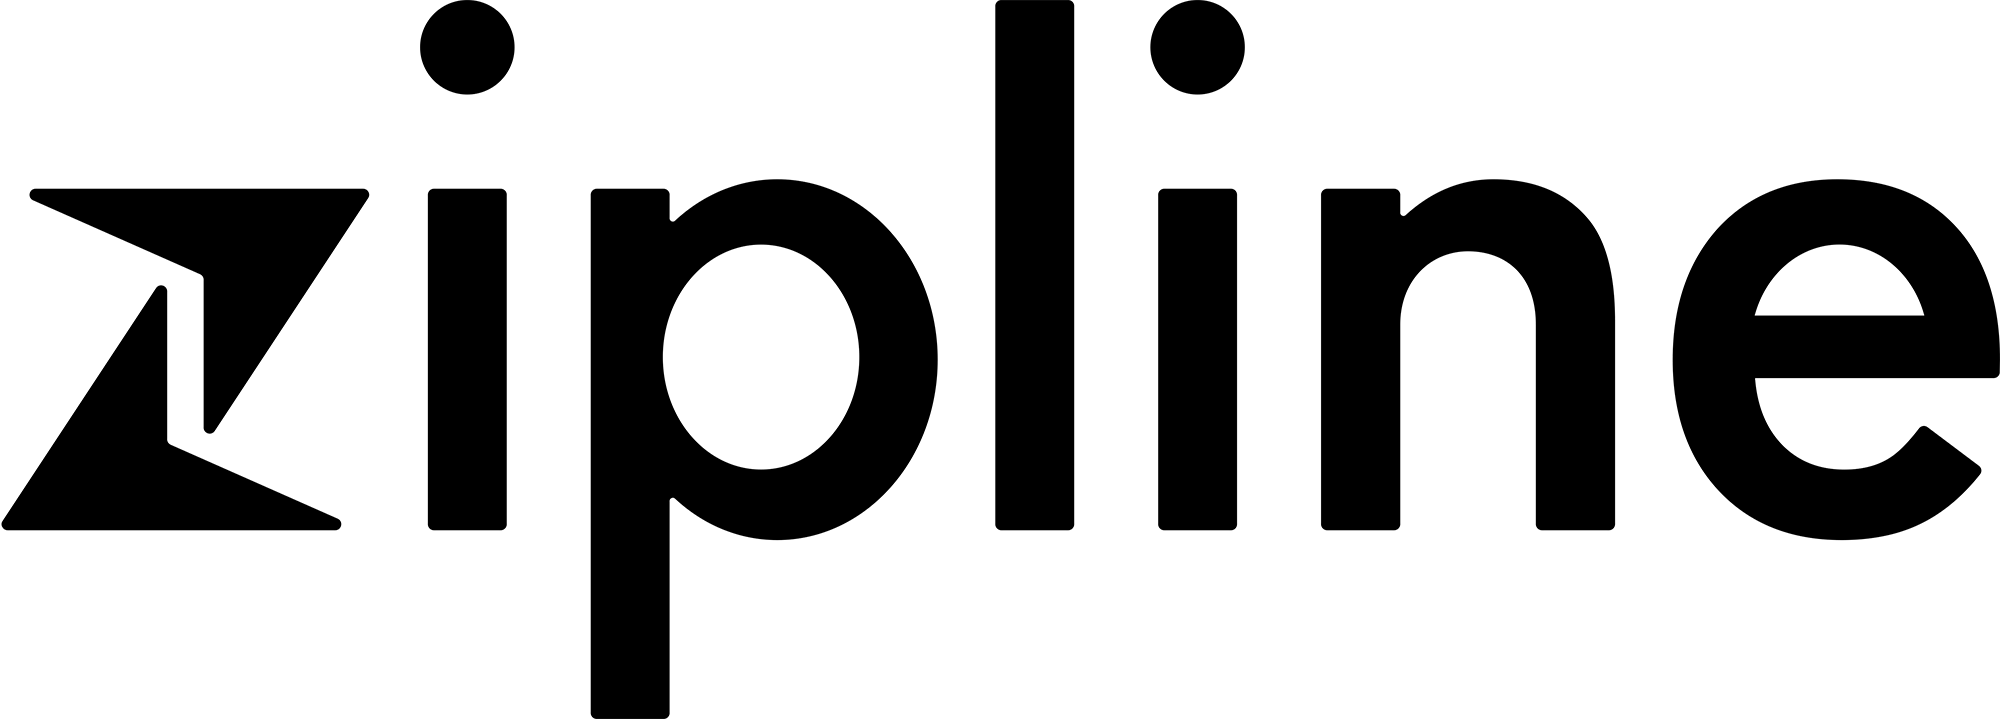 Zipline (drone delivery) - Wikipedia